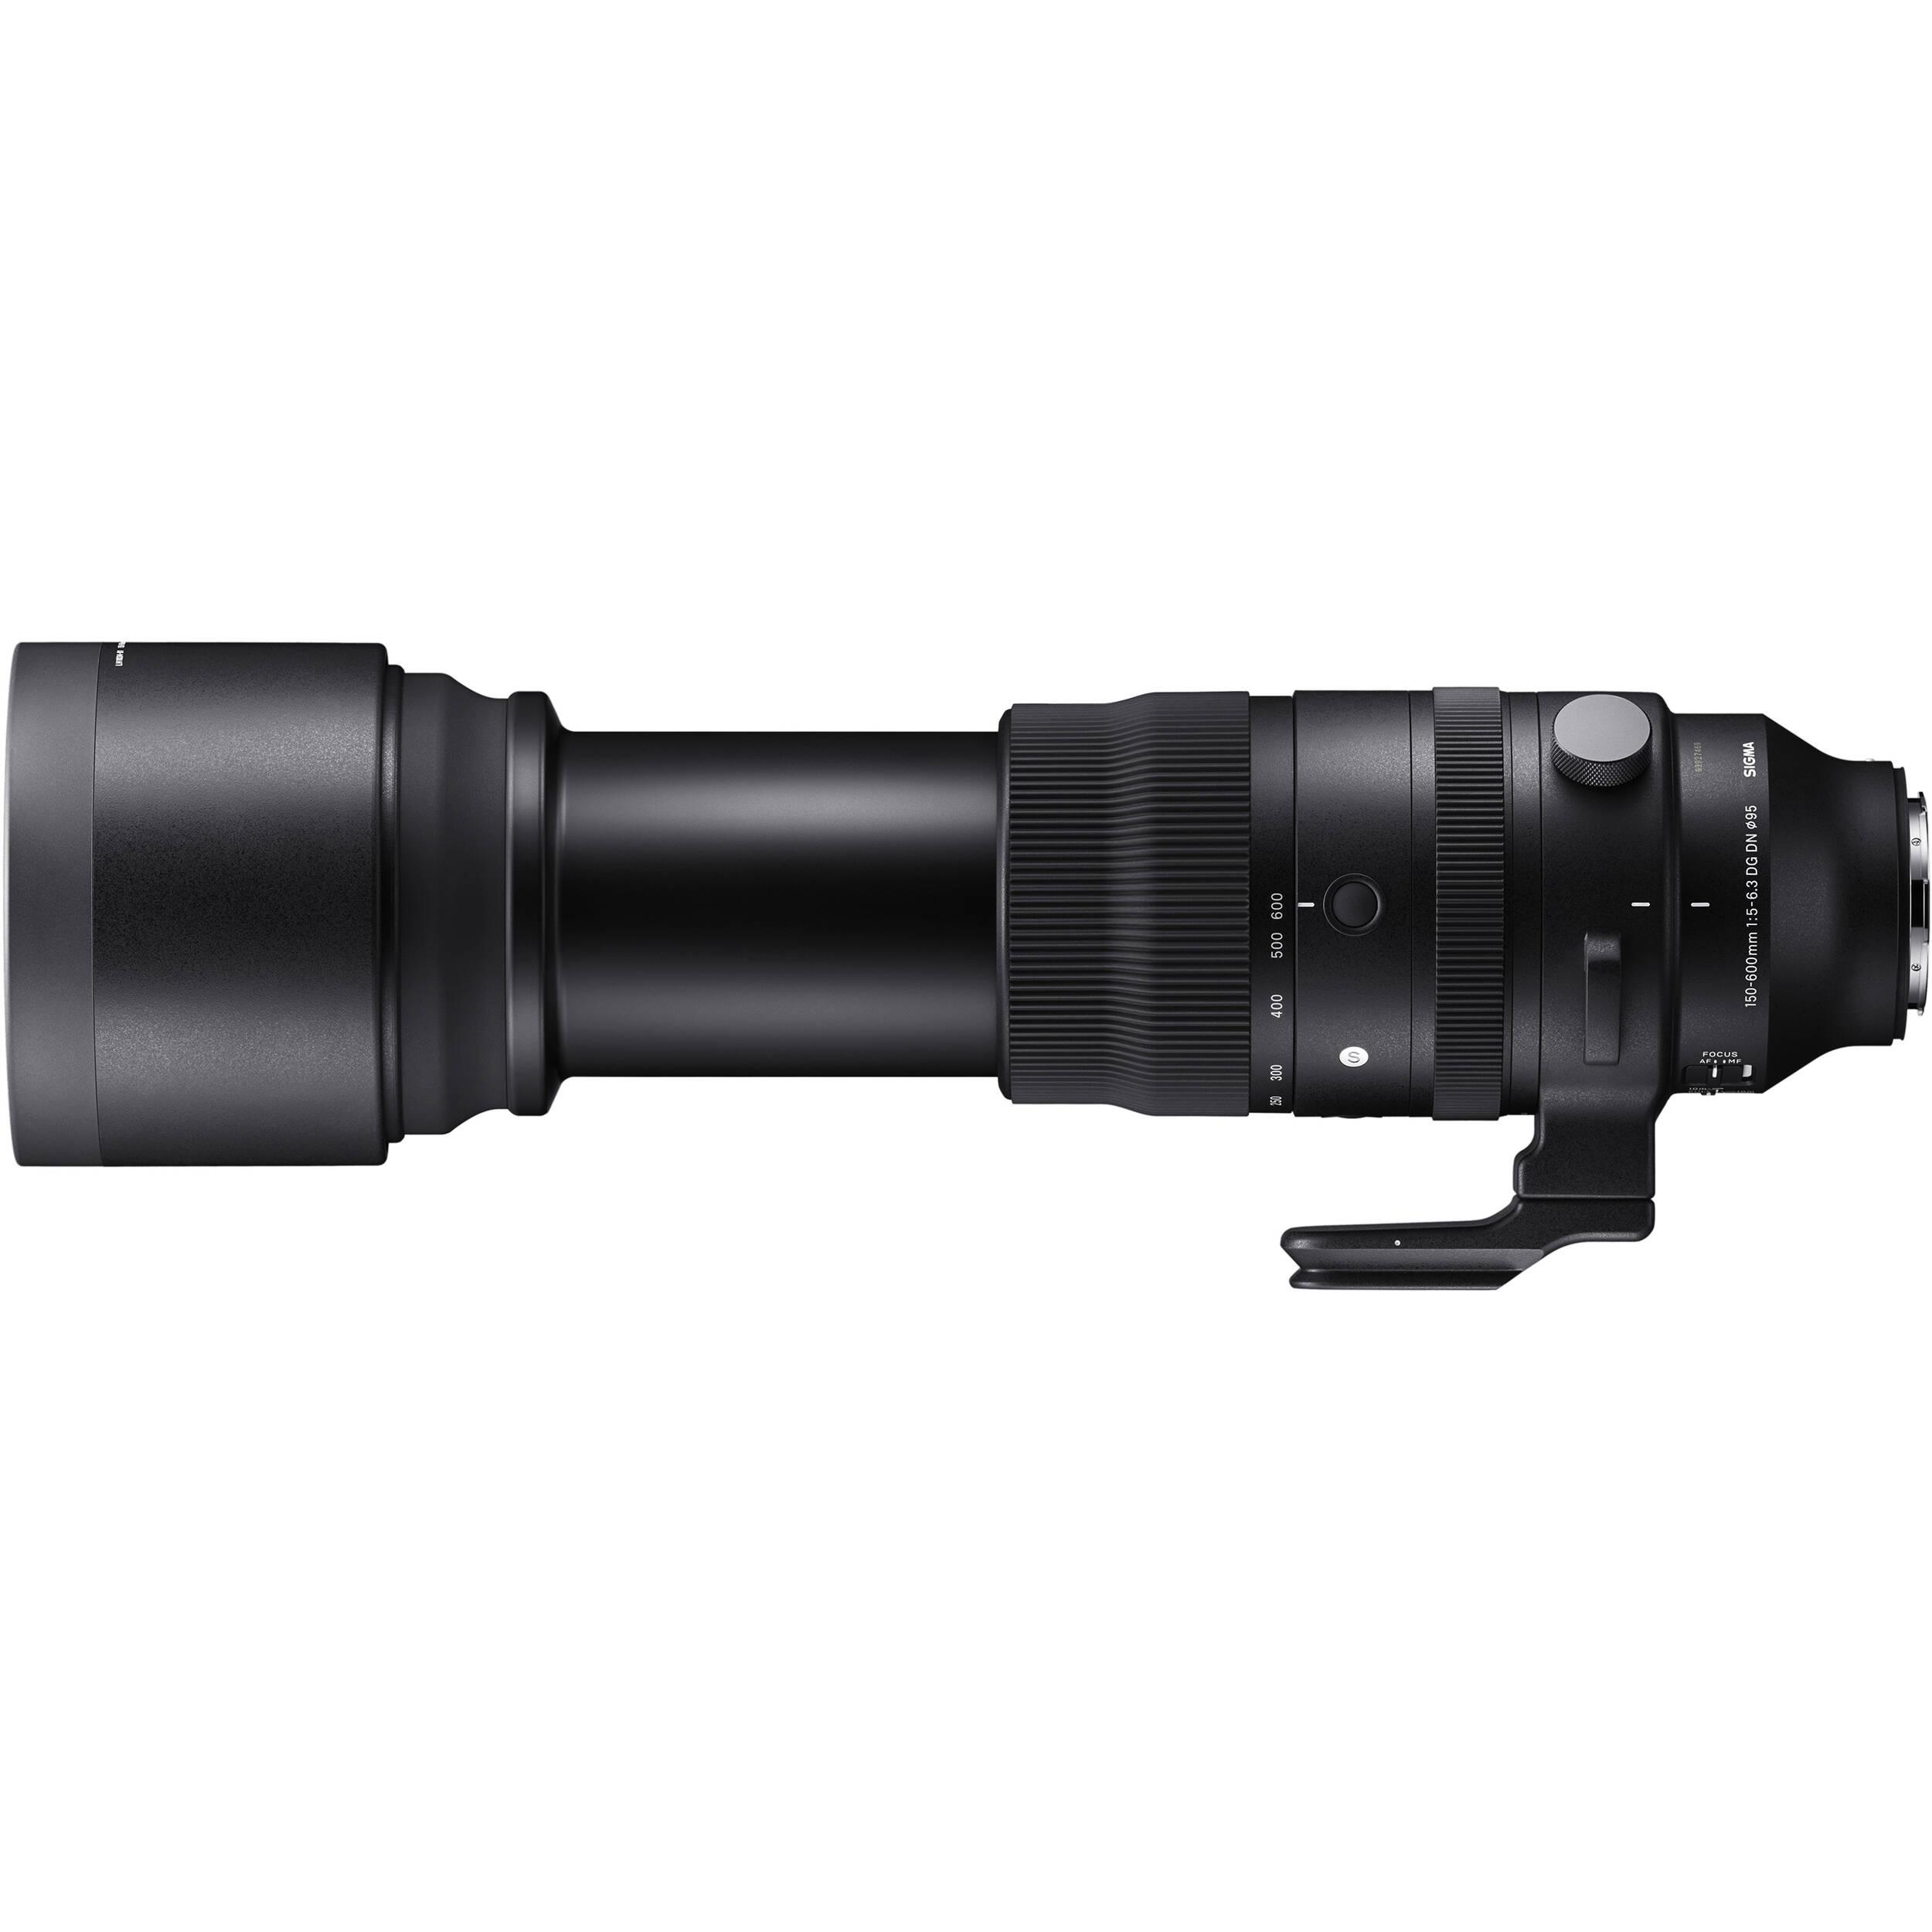 Sigma 150-600mm F5-6.3 DG DN OS Lens